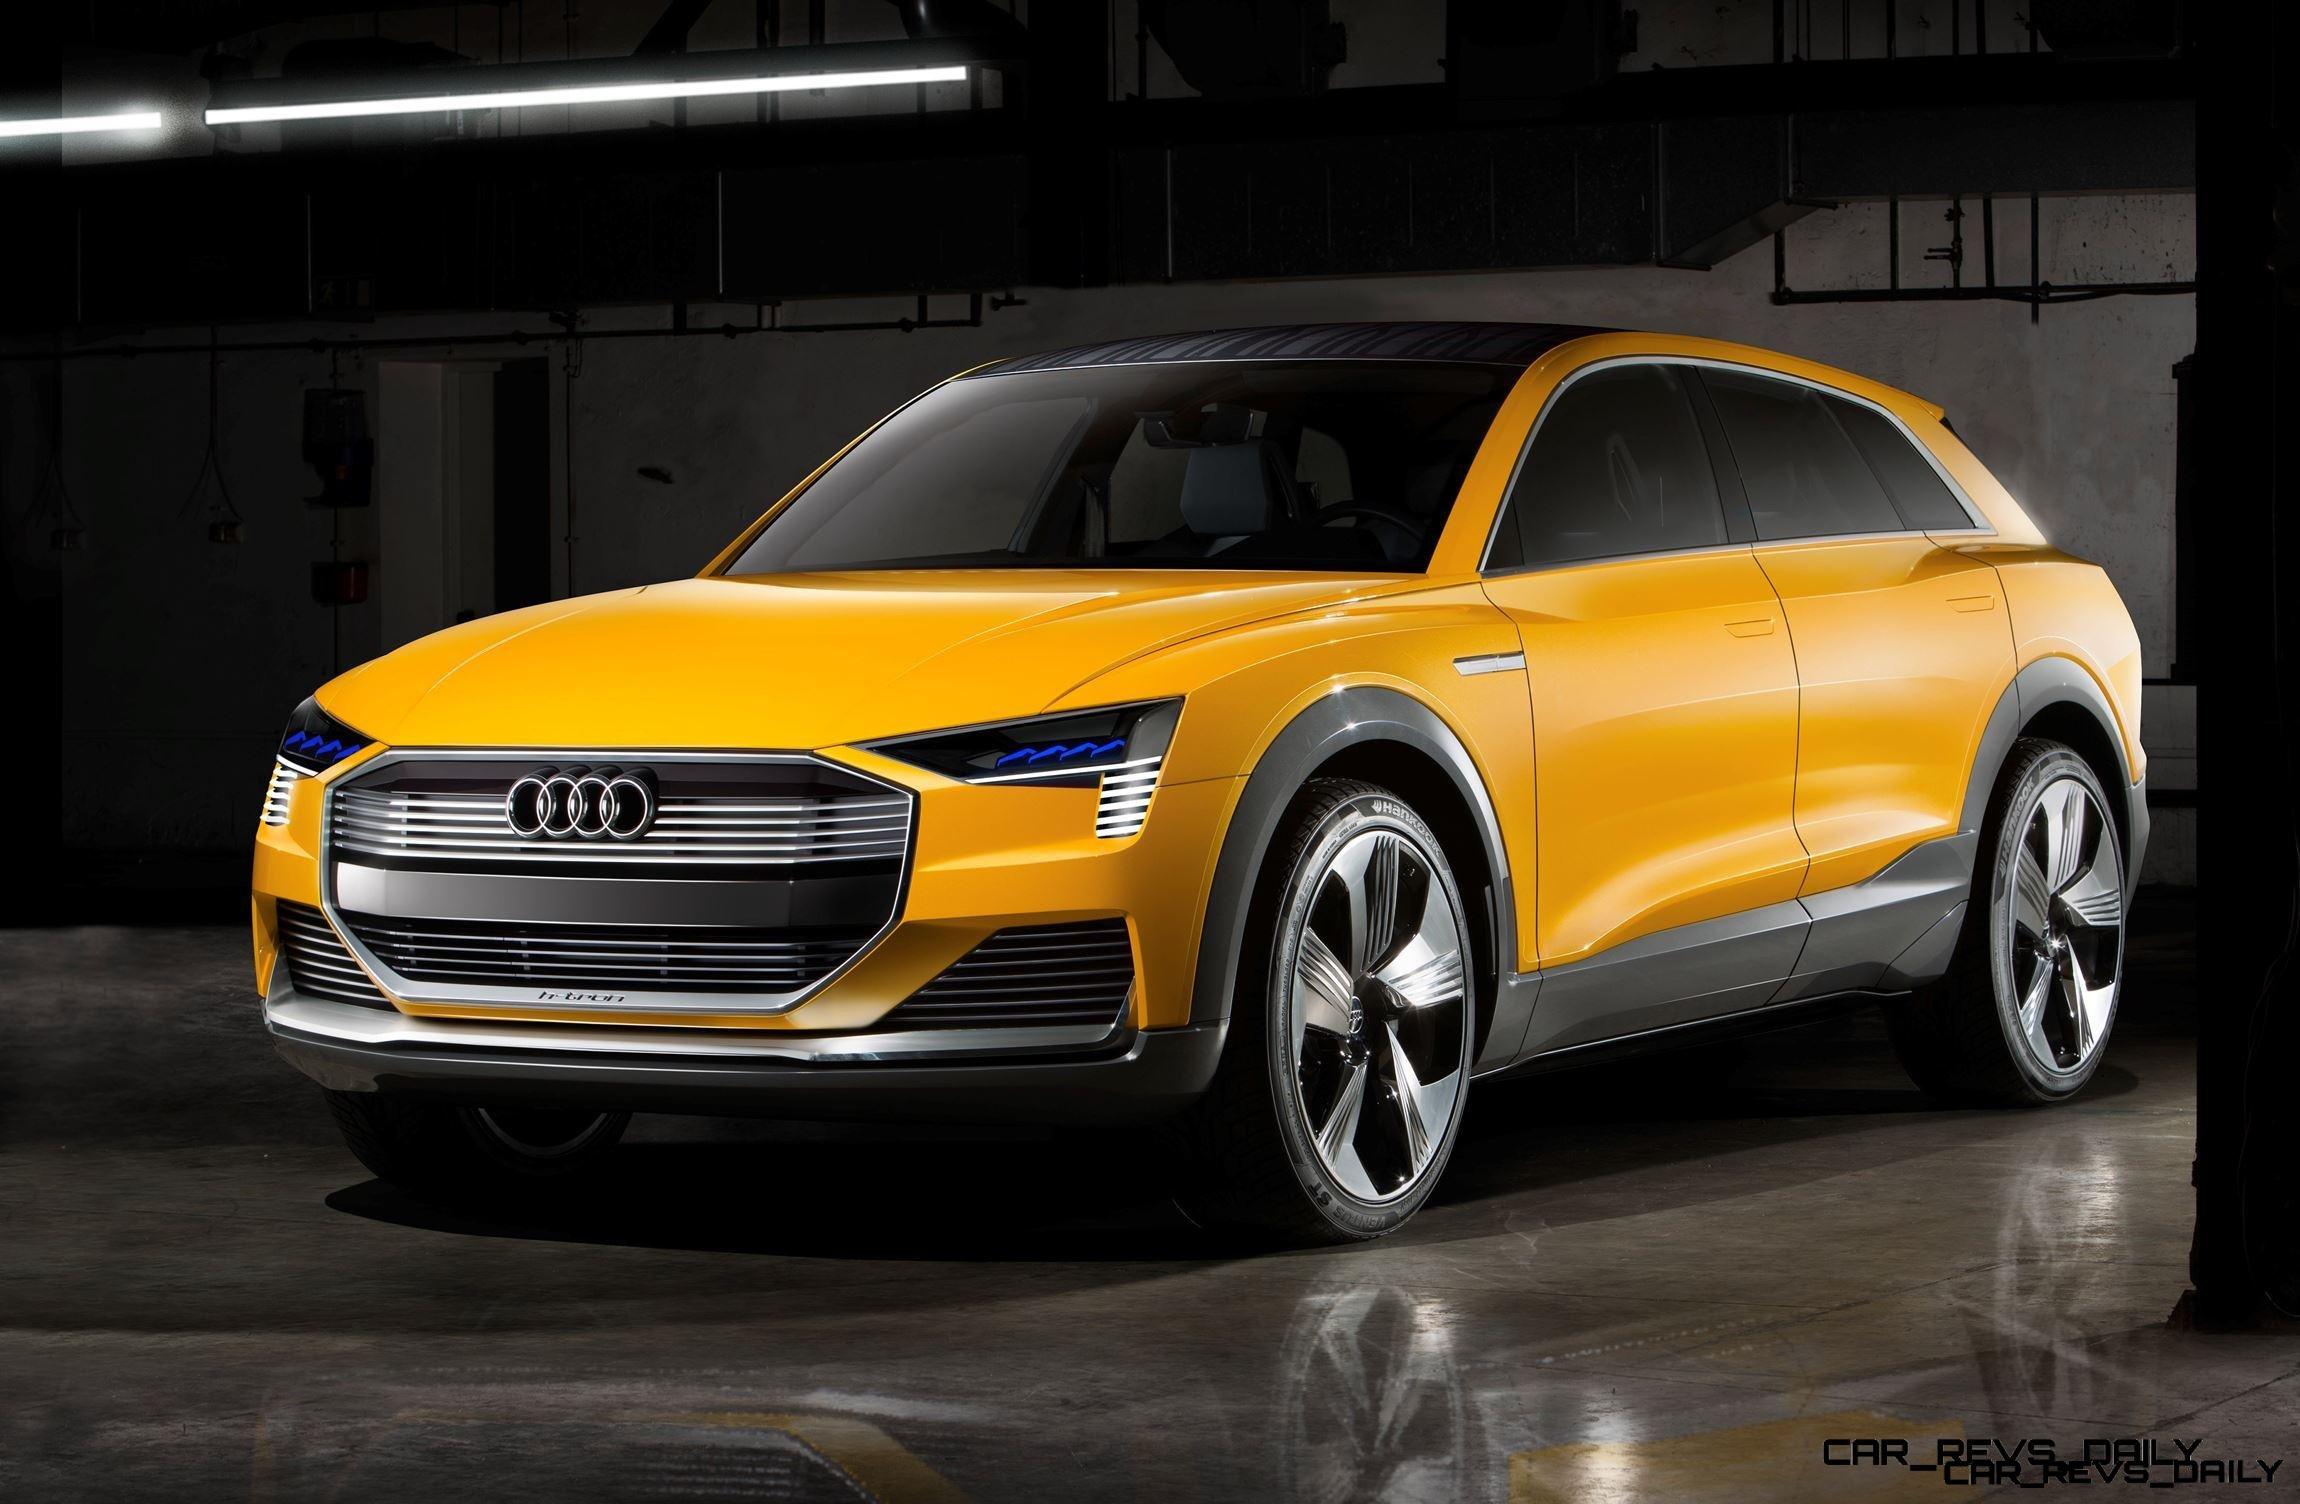 2016 Audi h-Tron Quattro Concept – Hypercomplex Tech Showcase Headed for Sale as $100k Tesla Rival as 2018 Q6